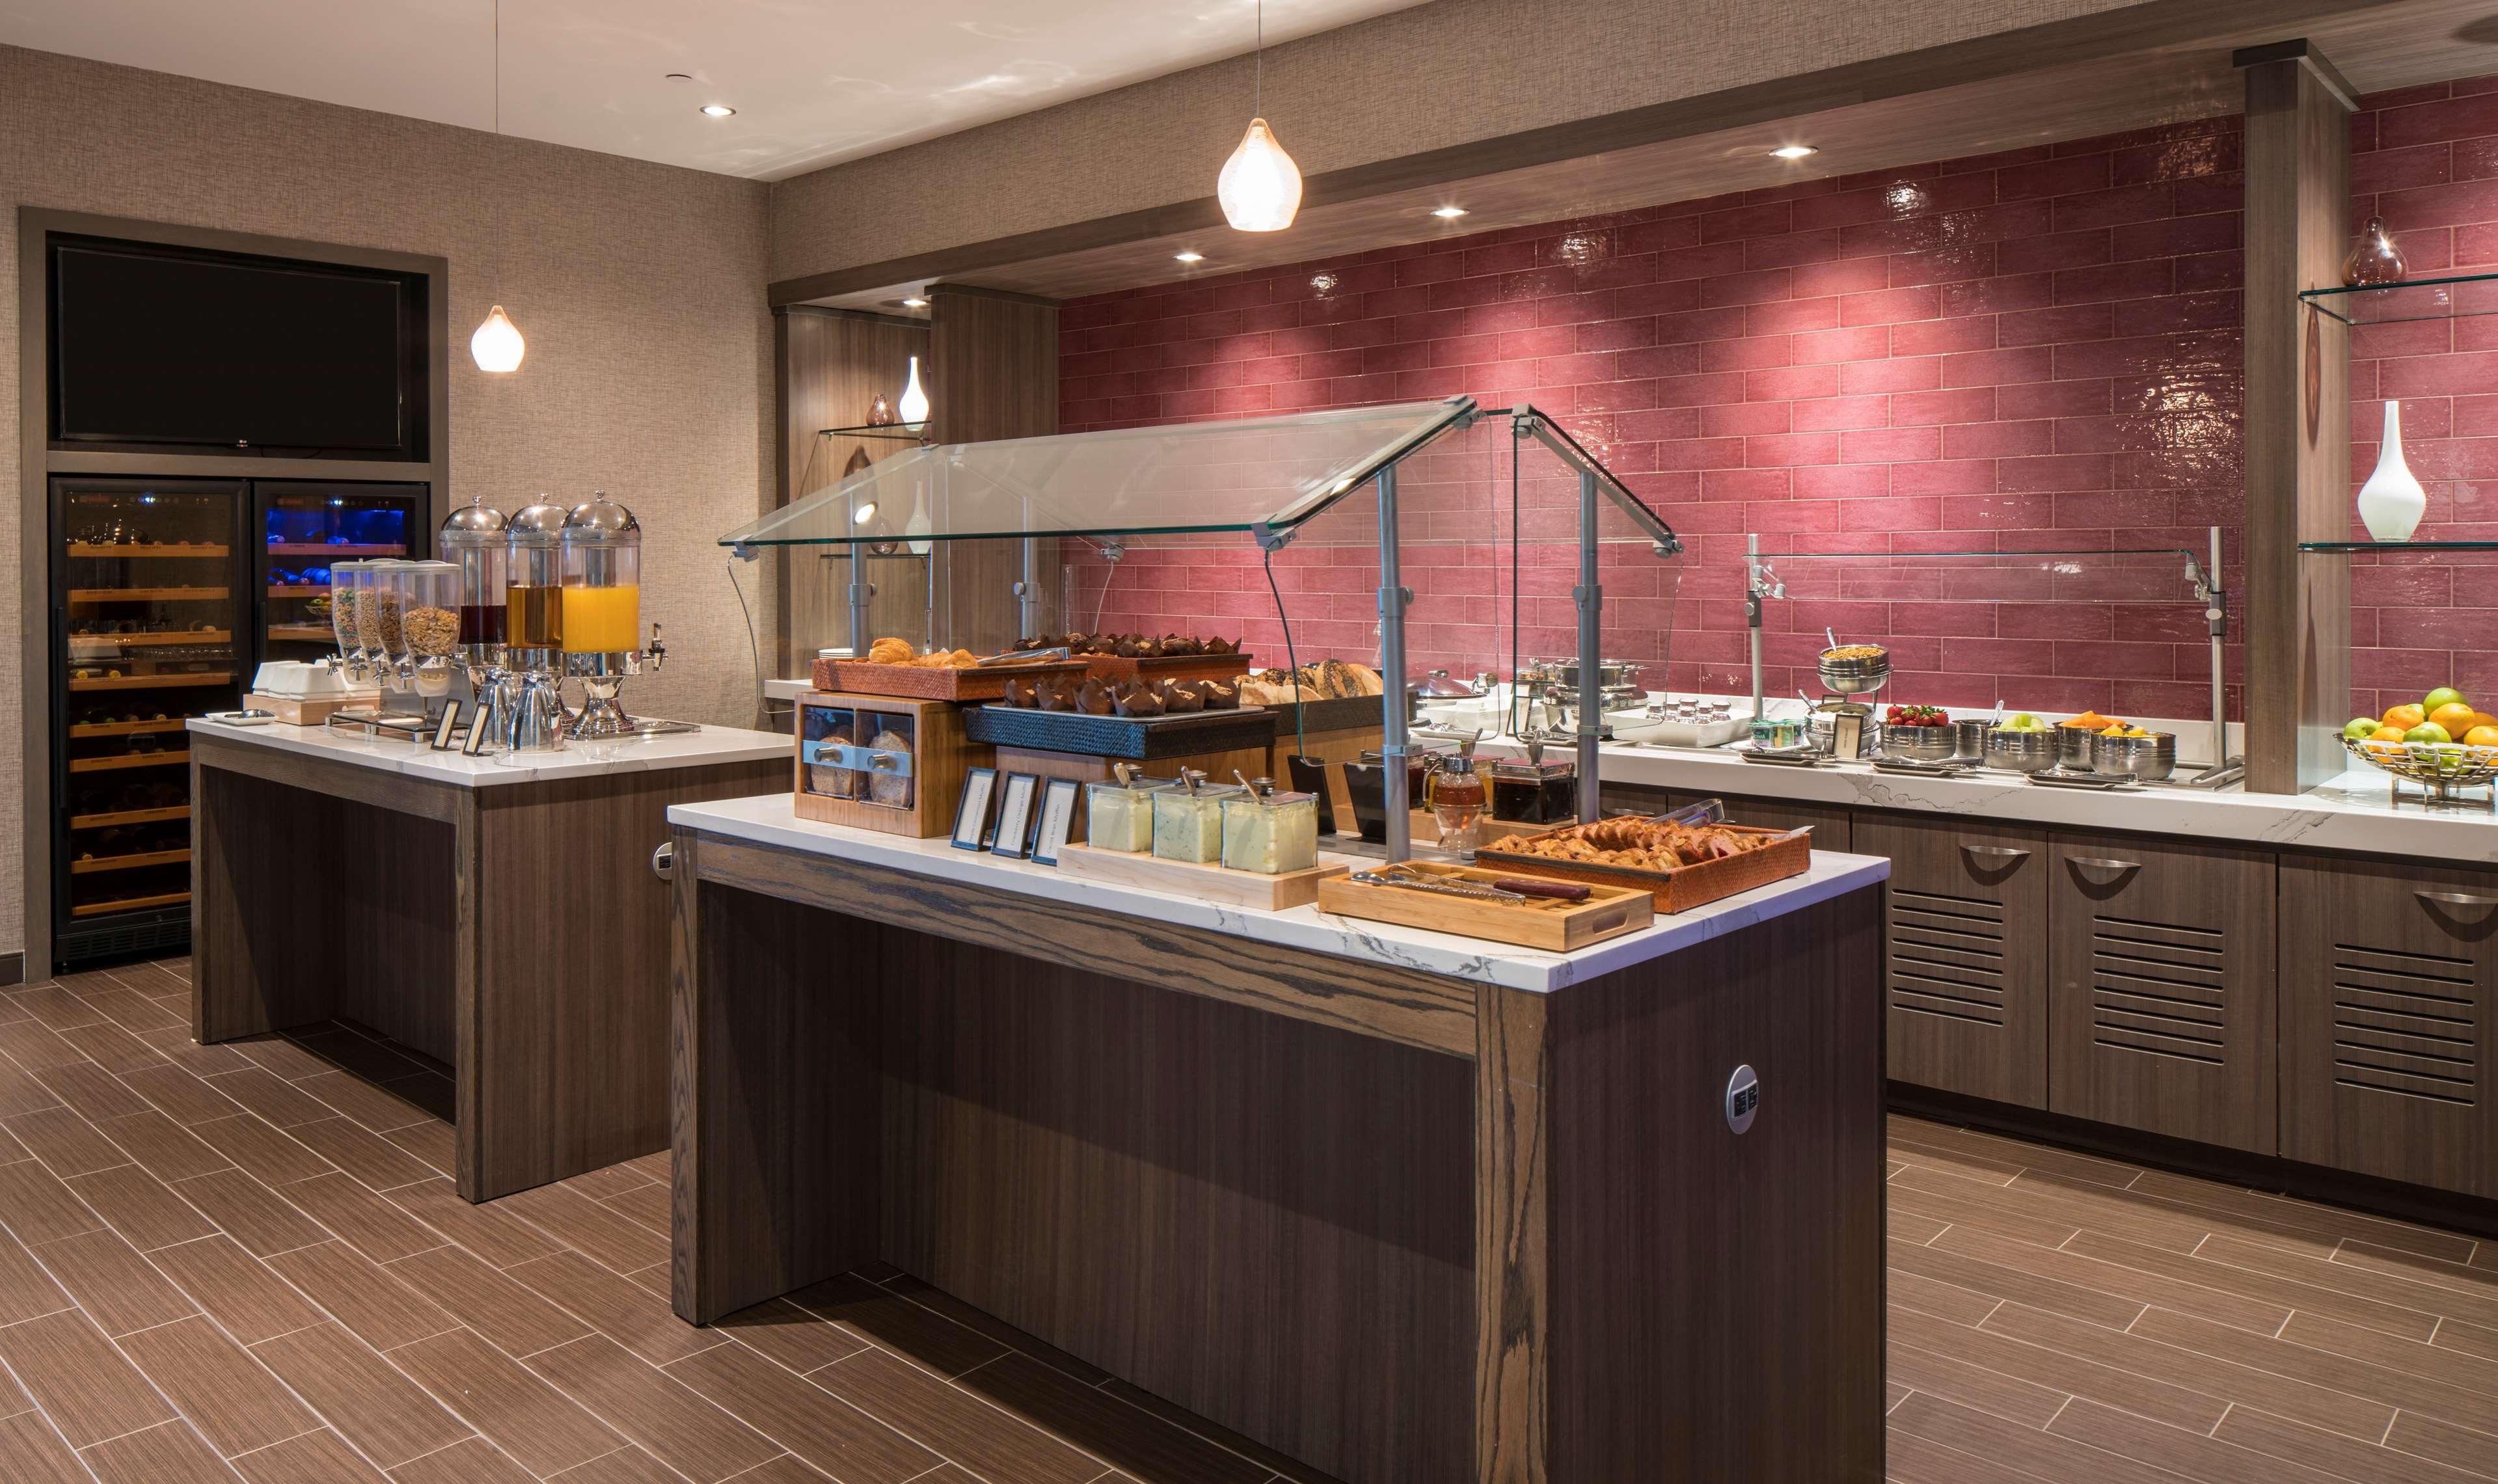 Hilton Washington DC/Rockville Hotel & Executive Meeting Ctr image 14